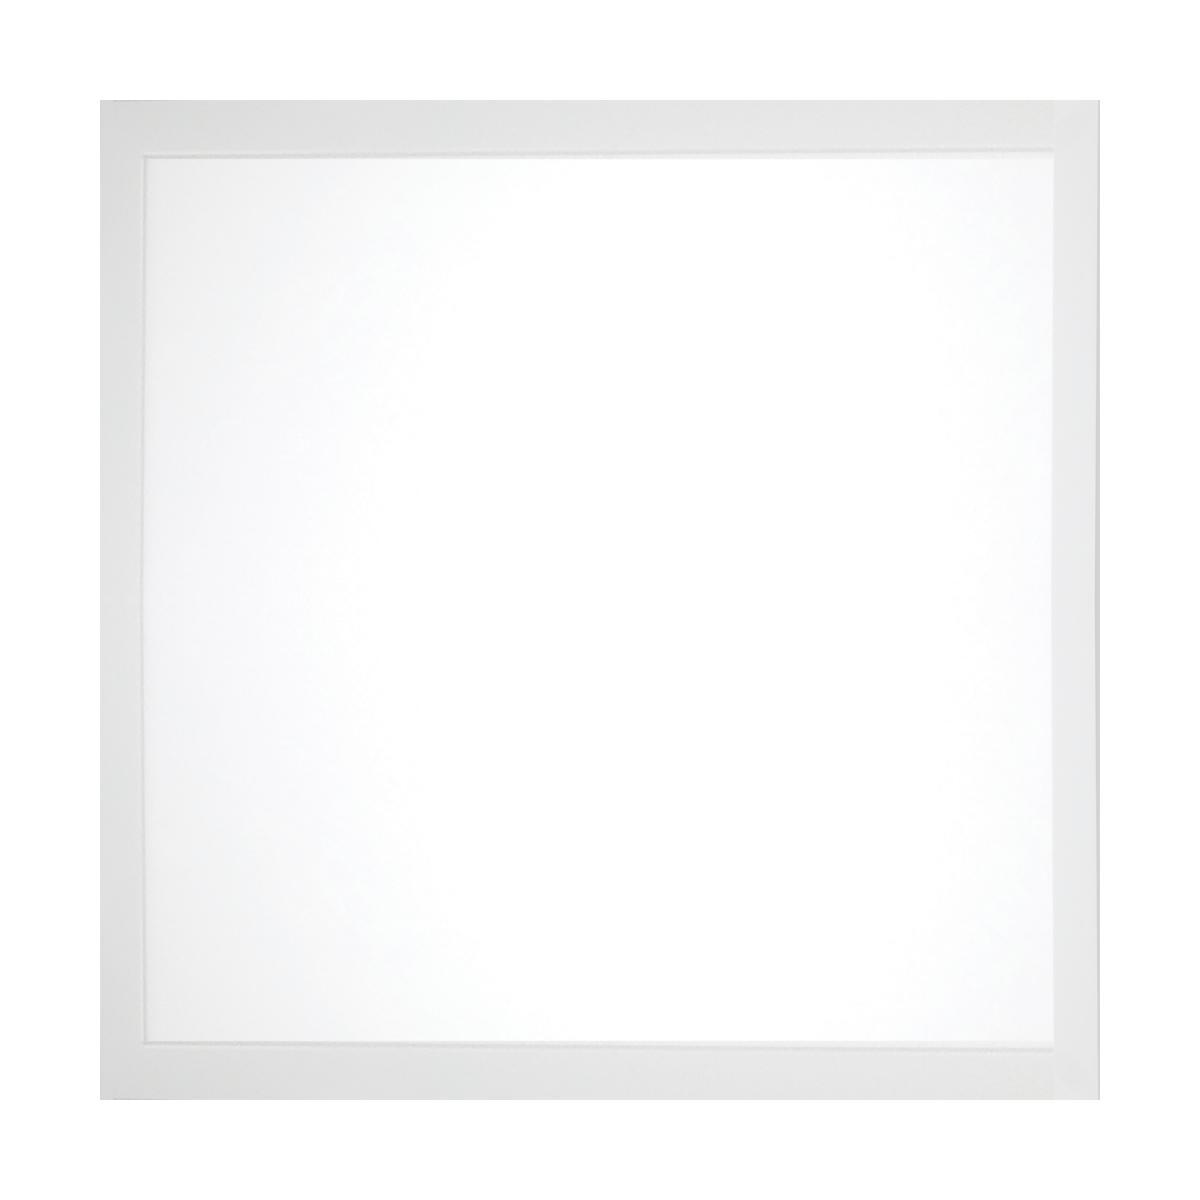 65-585 2X2 LED EM BACKLIT FLAT PANEL